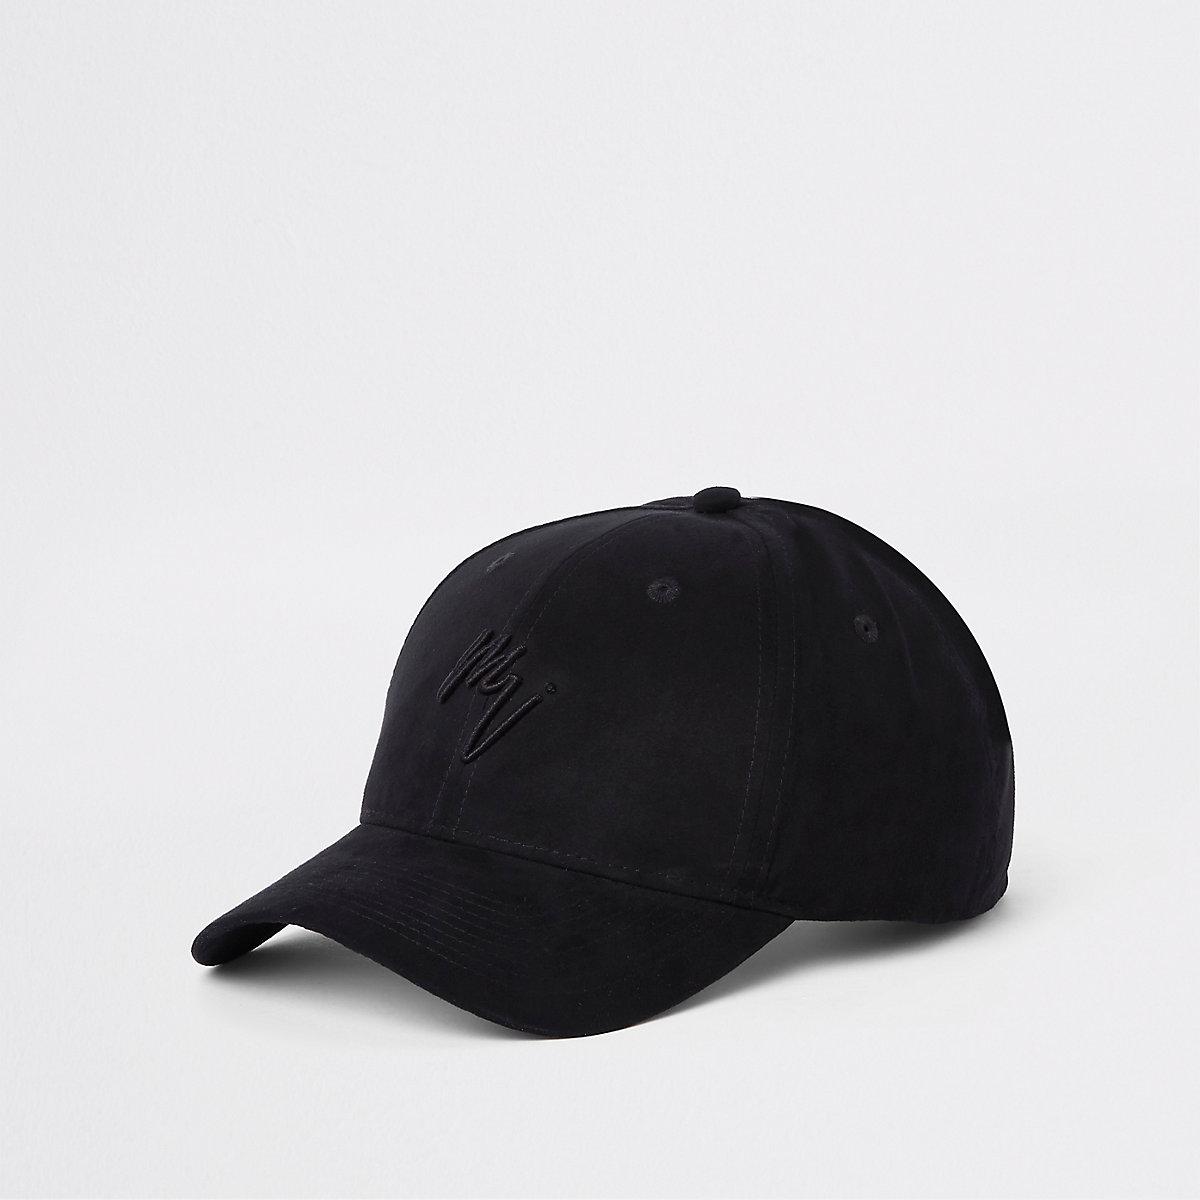 Black suede 'Maison Riviera' baseball cap